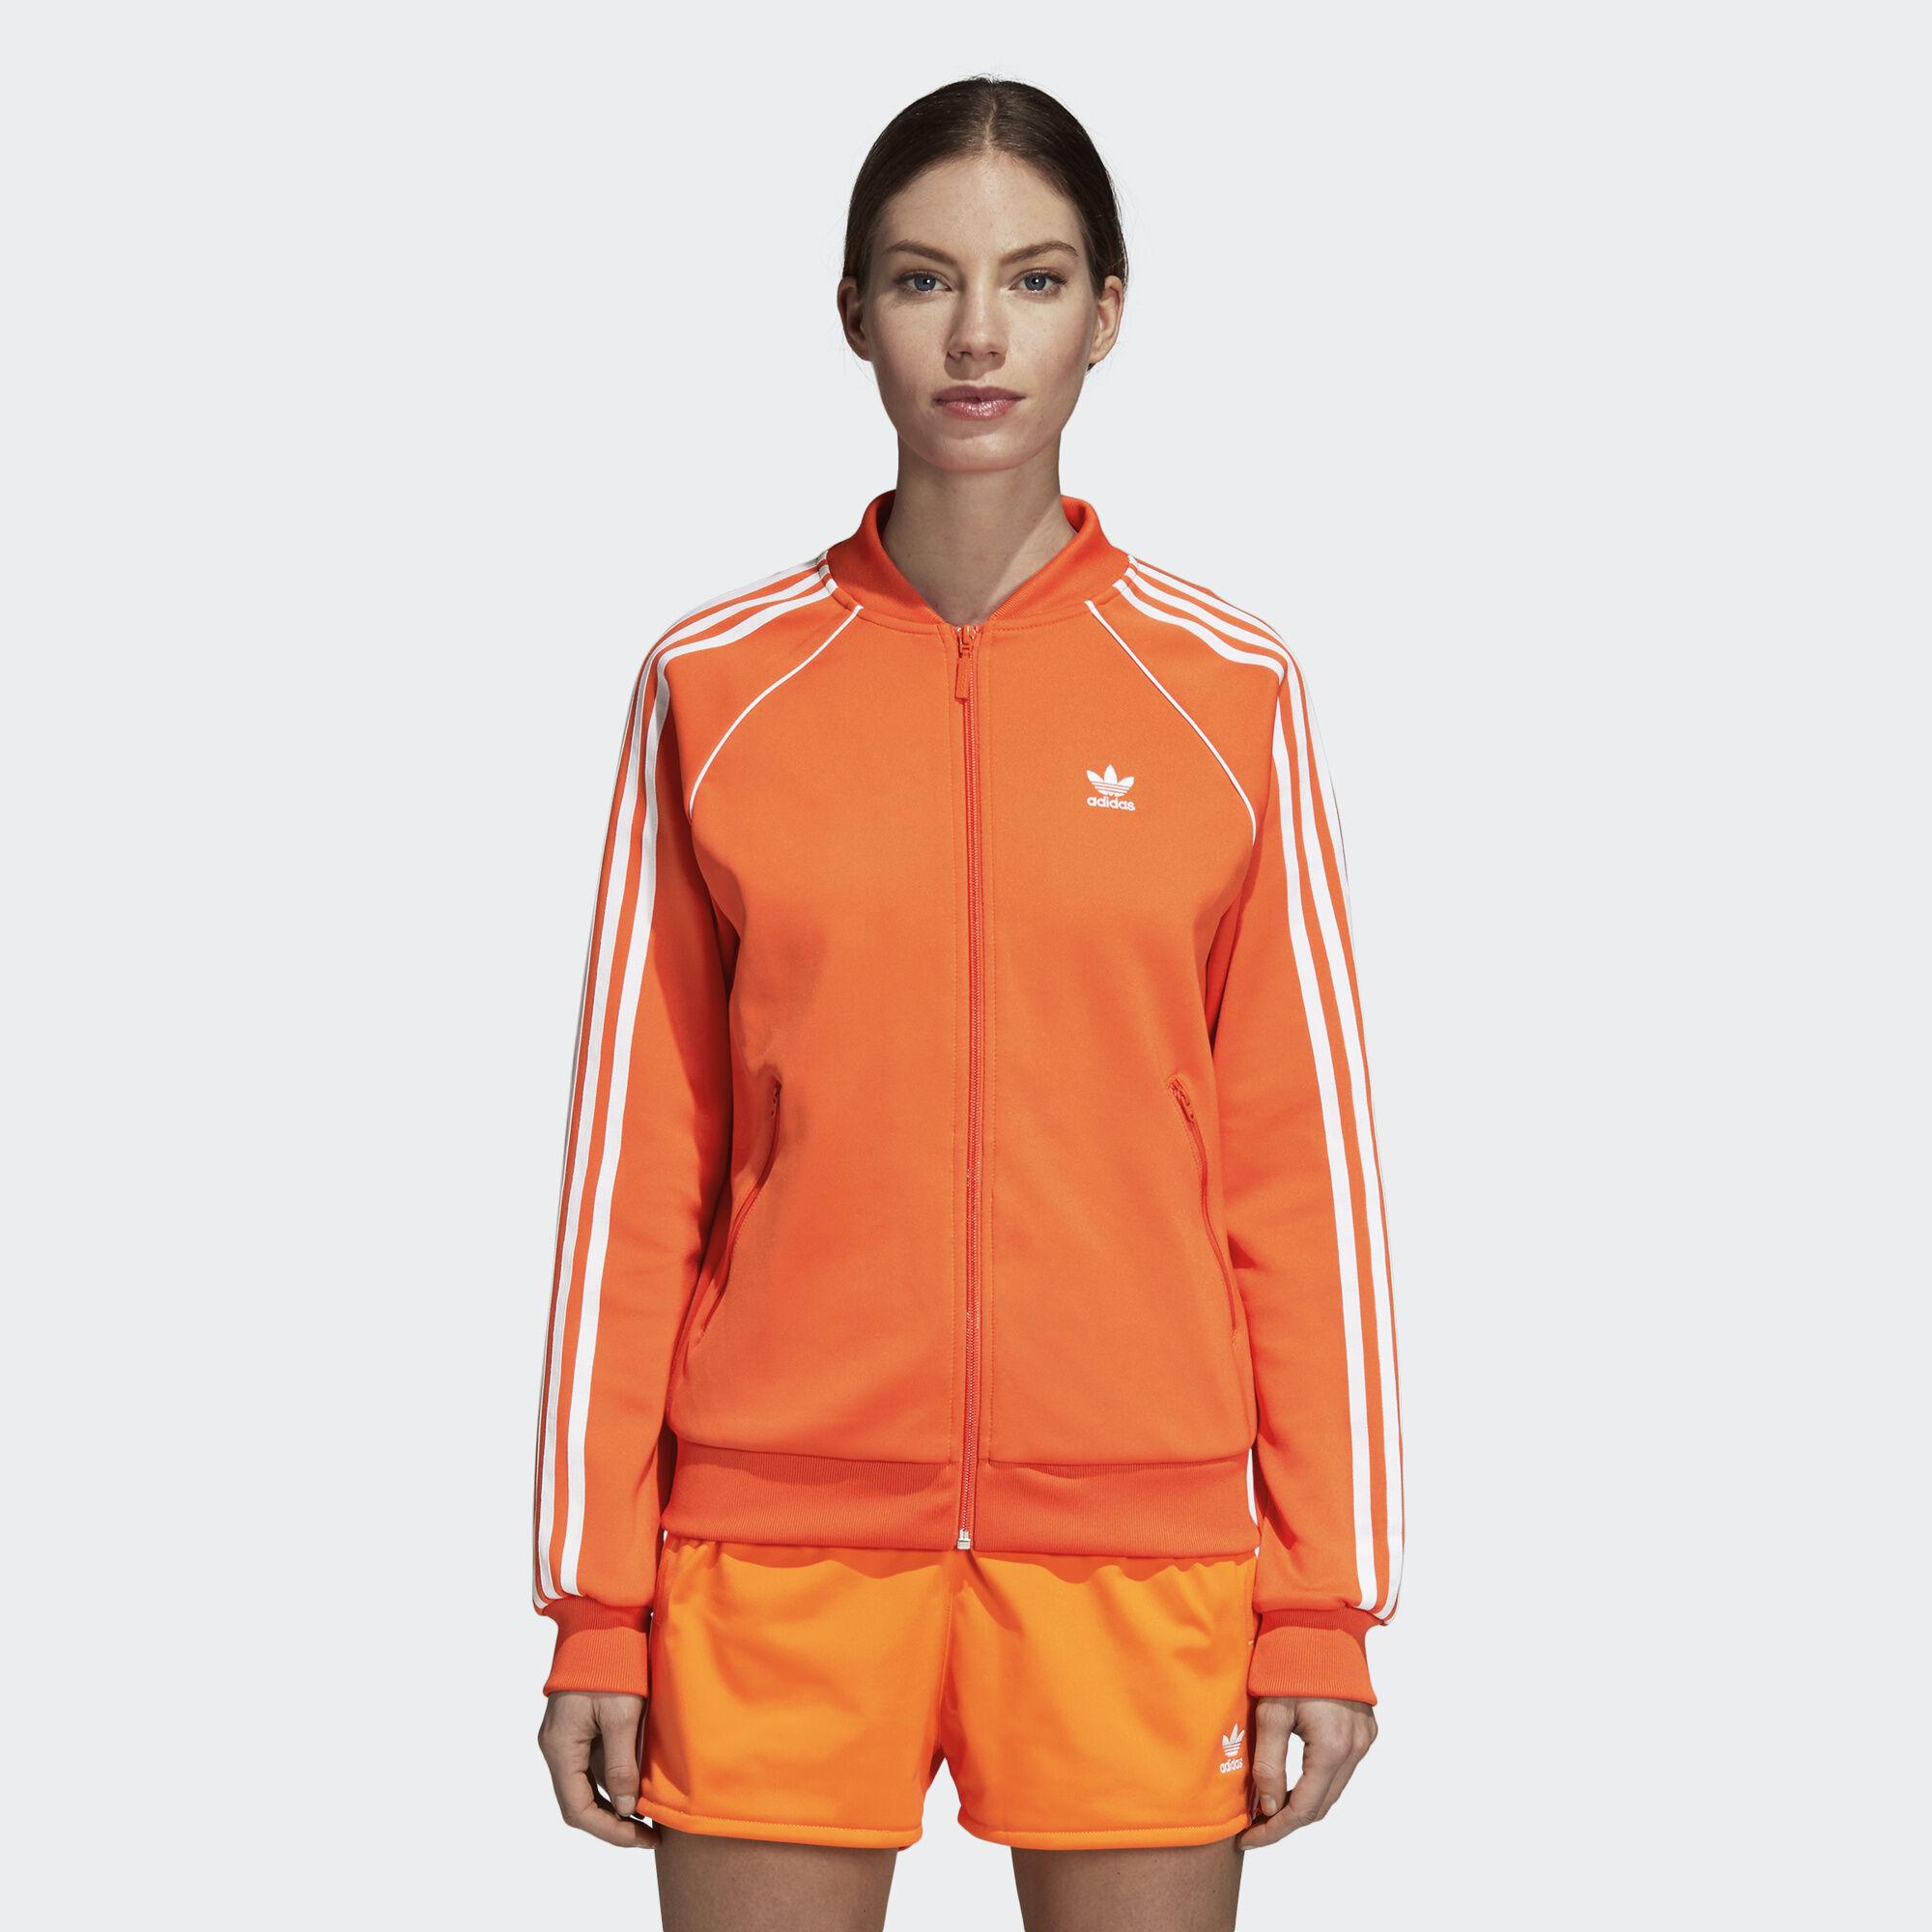 Chaqueta Chaqueta Sst Adidas Chaqueta Adidas Regional Regional Orange Orange Sst Sst qTwtt5